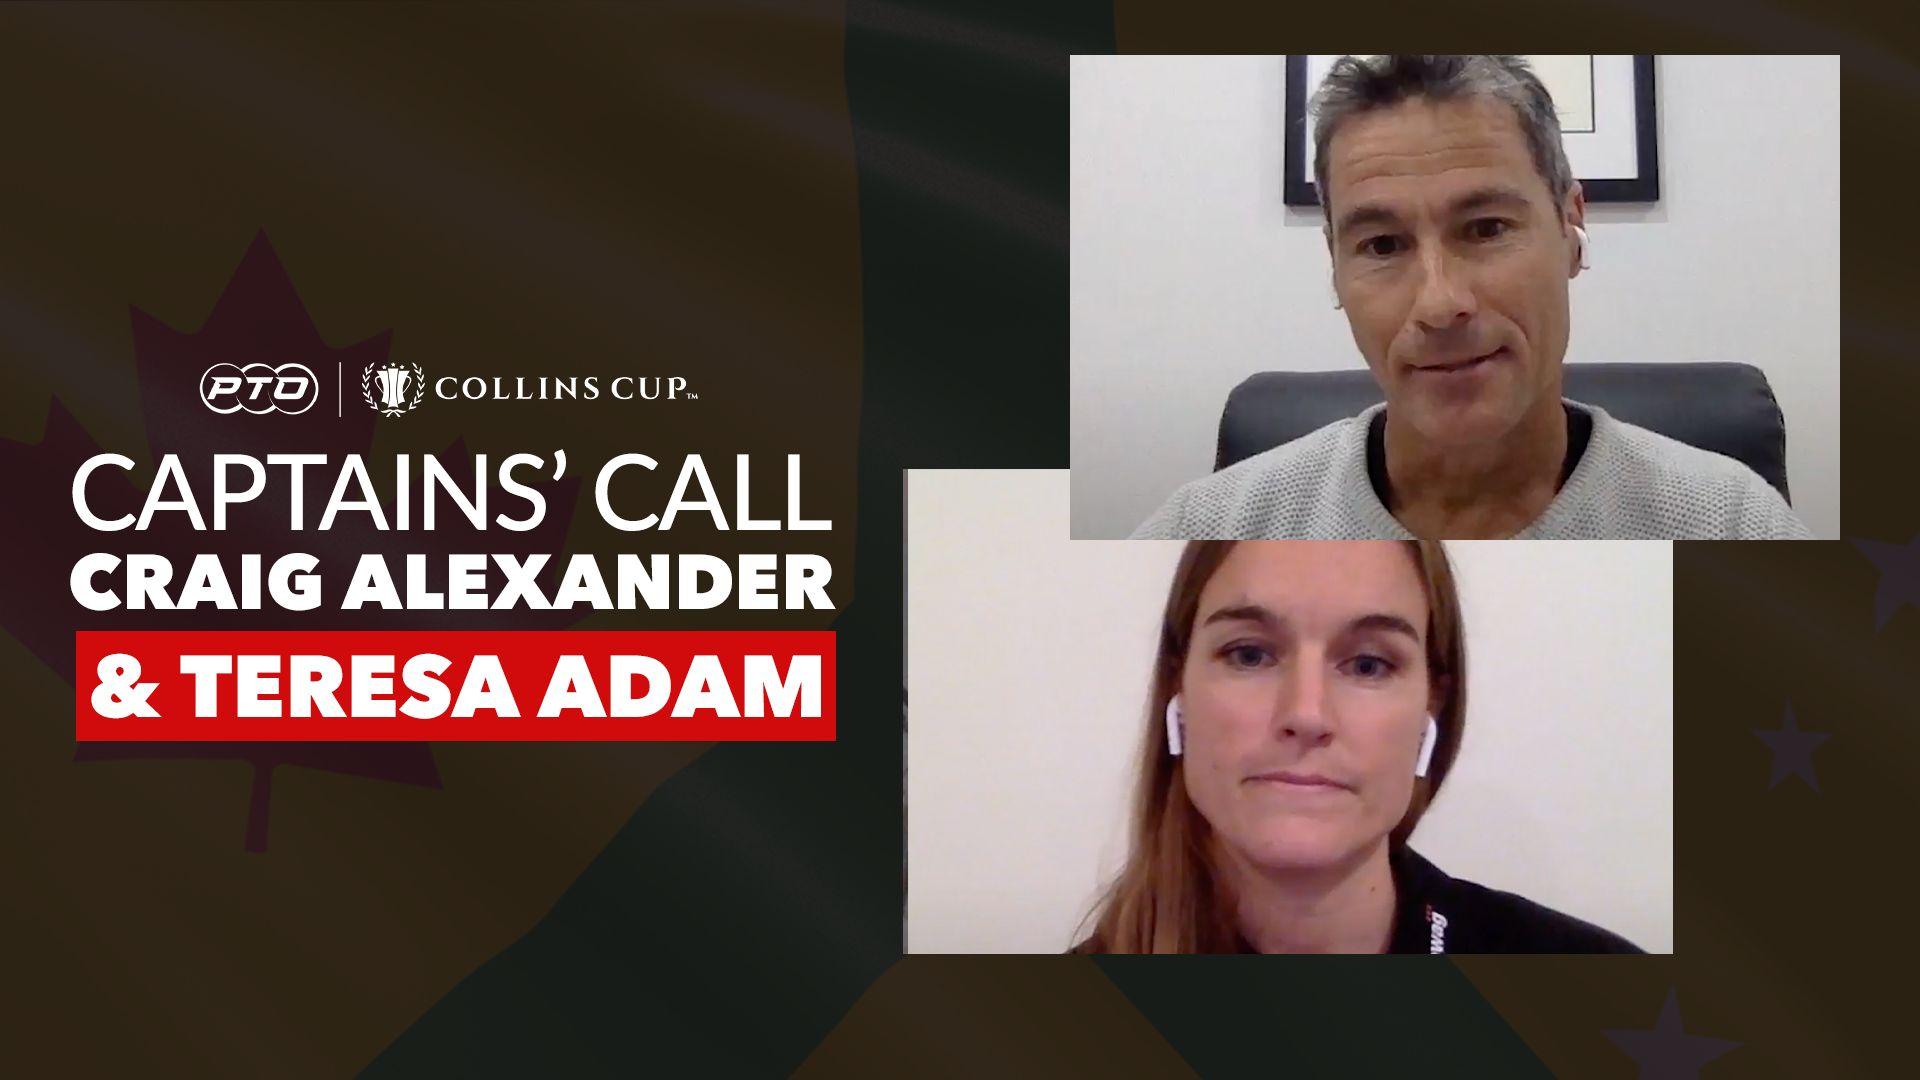 Captains' Call: Team Internationals - Craig 'Crowie' Alexander & Teresa Adam